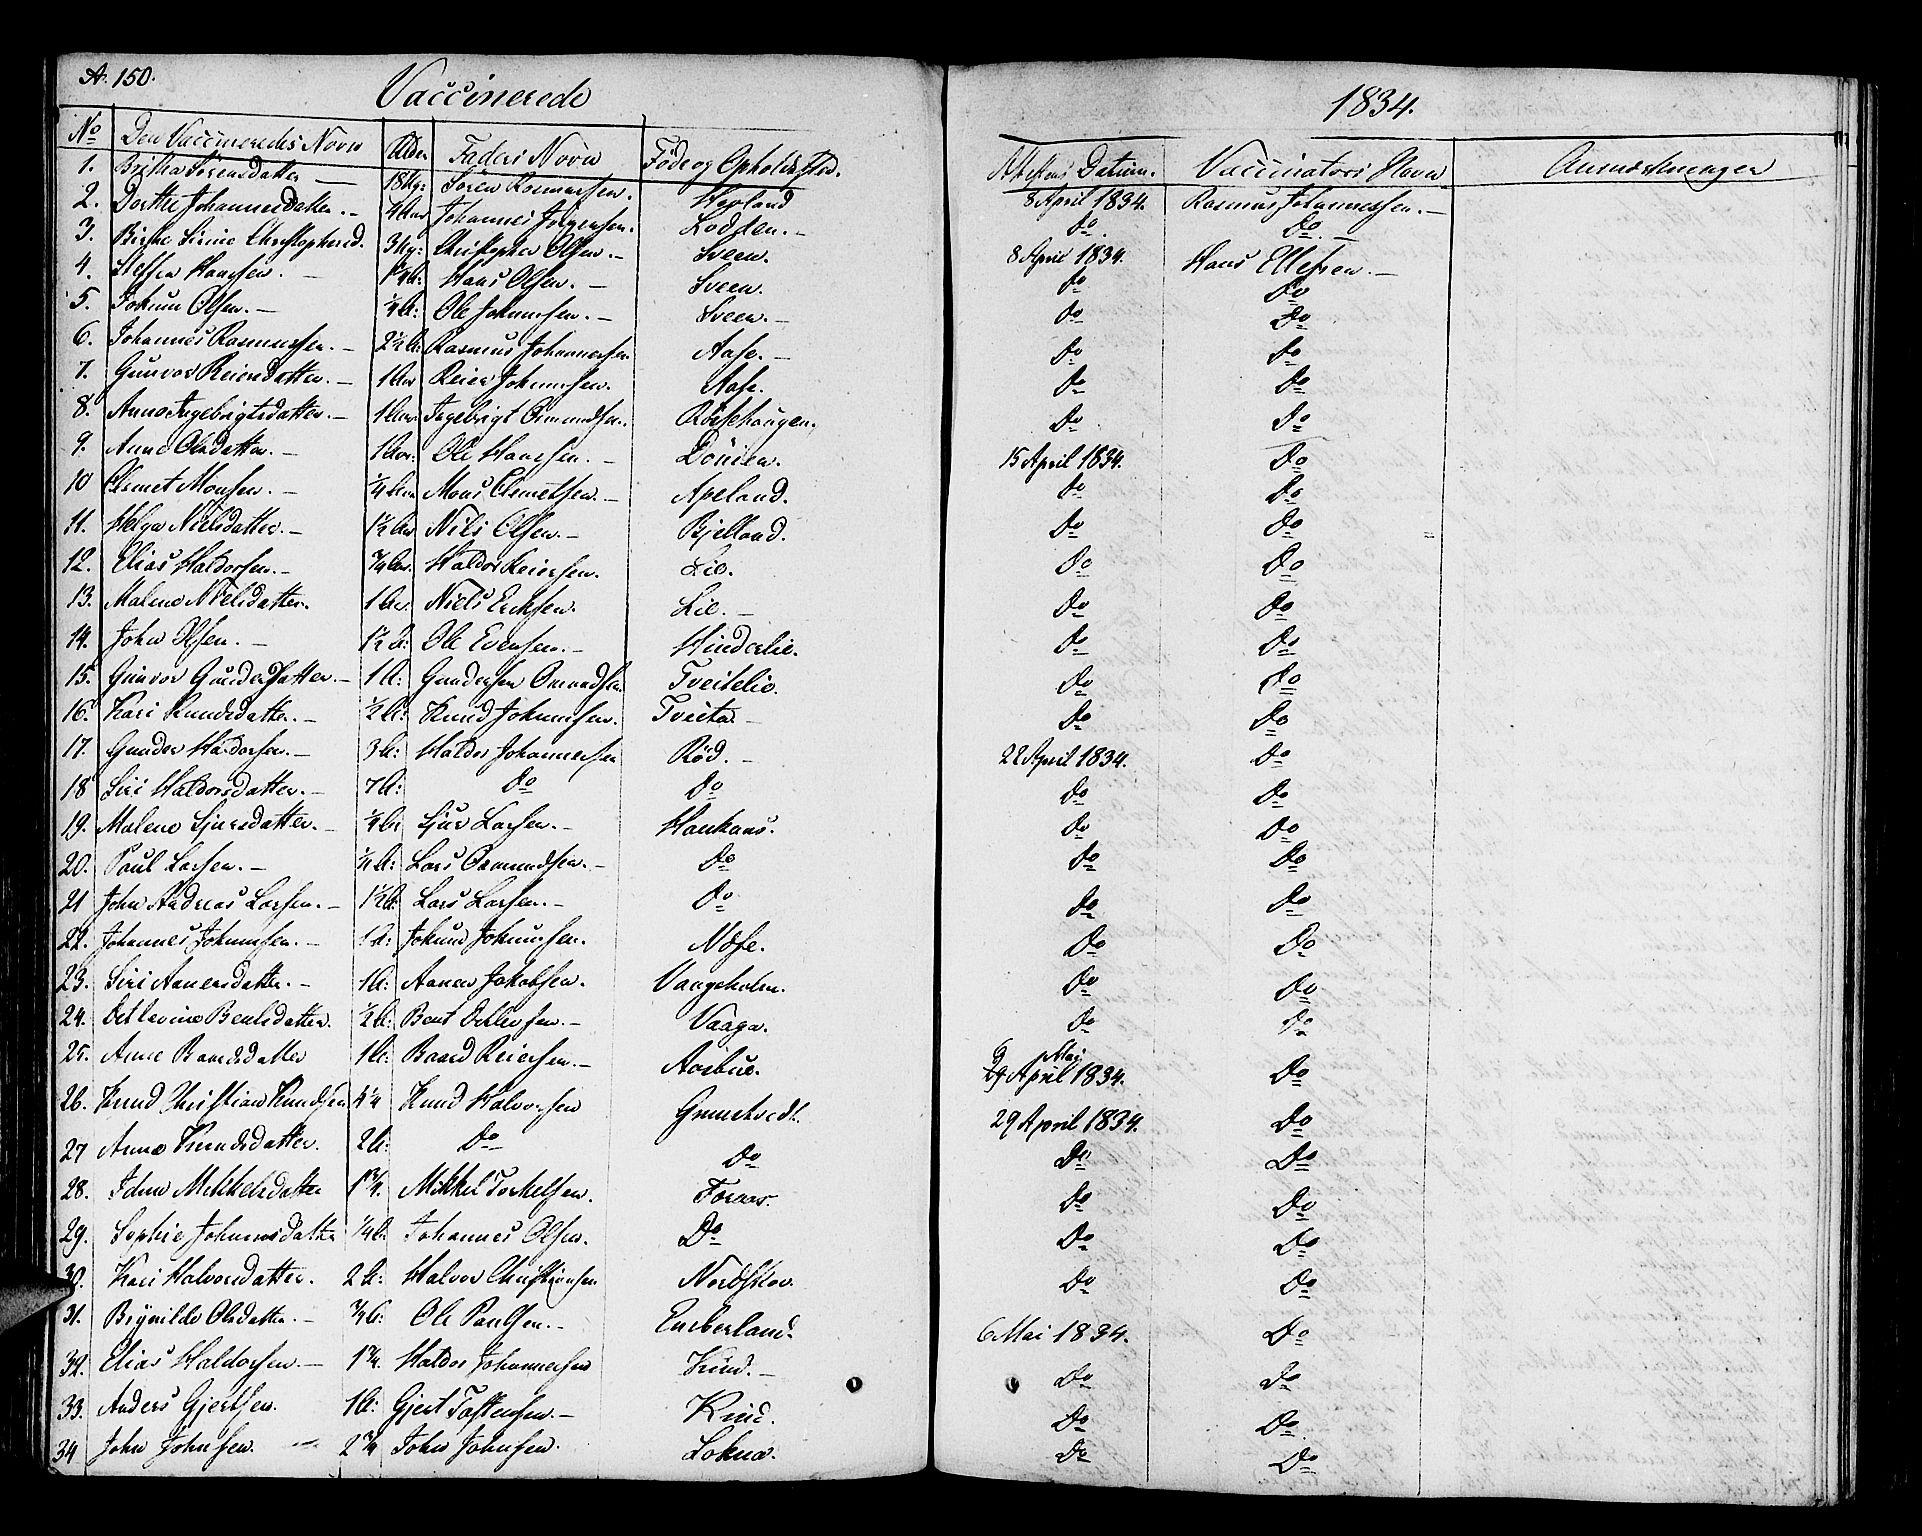 SAB, Finnås sokneprestembete, H/Ha/Haa/Haaa/L0005: Ministerialbok nr. A 5, 1823-1835, s. 150